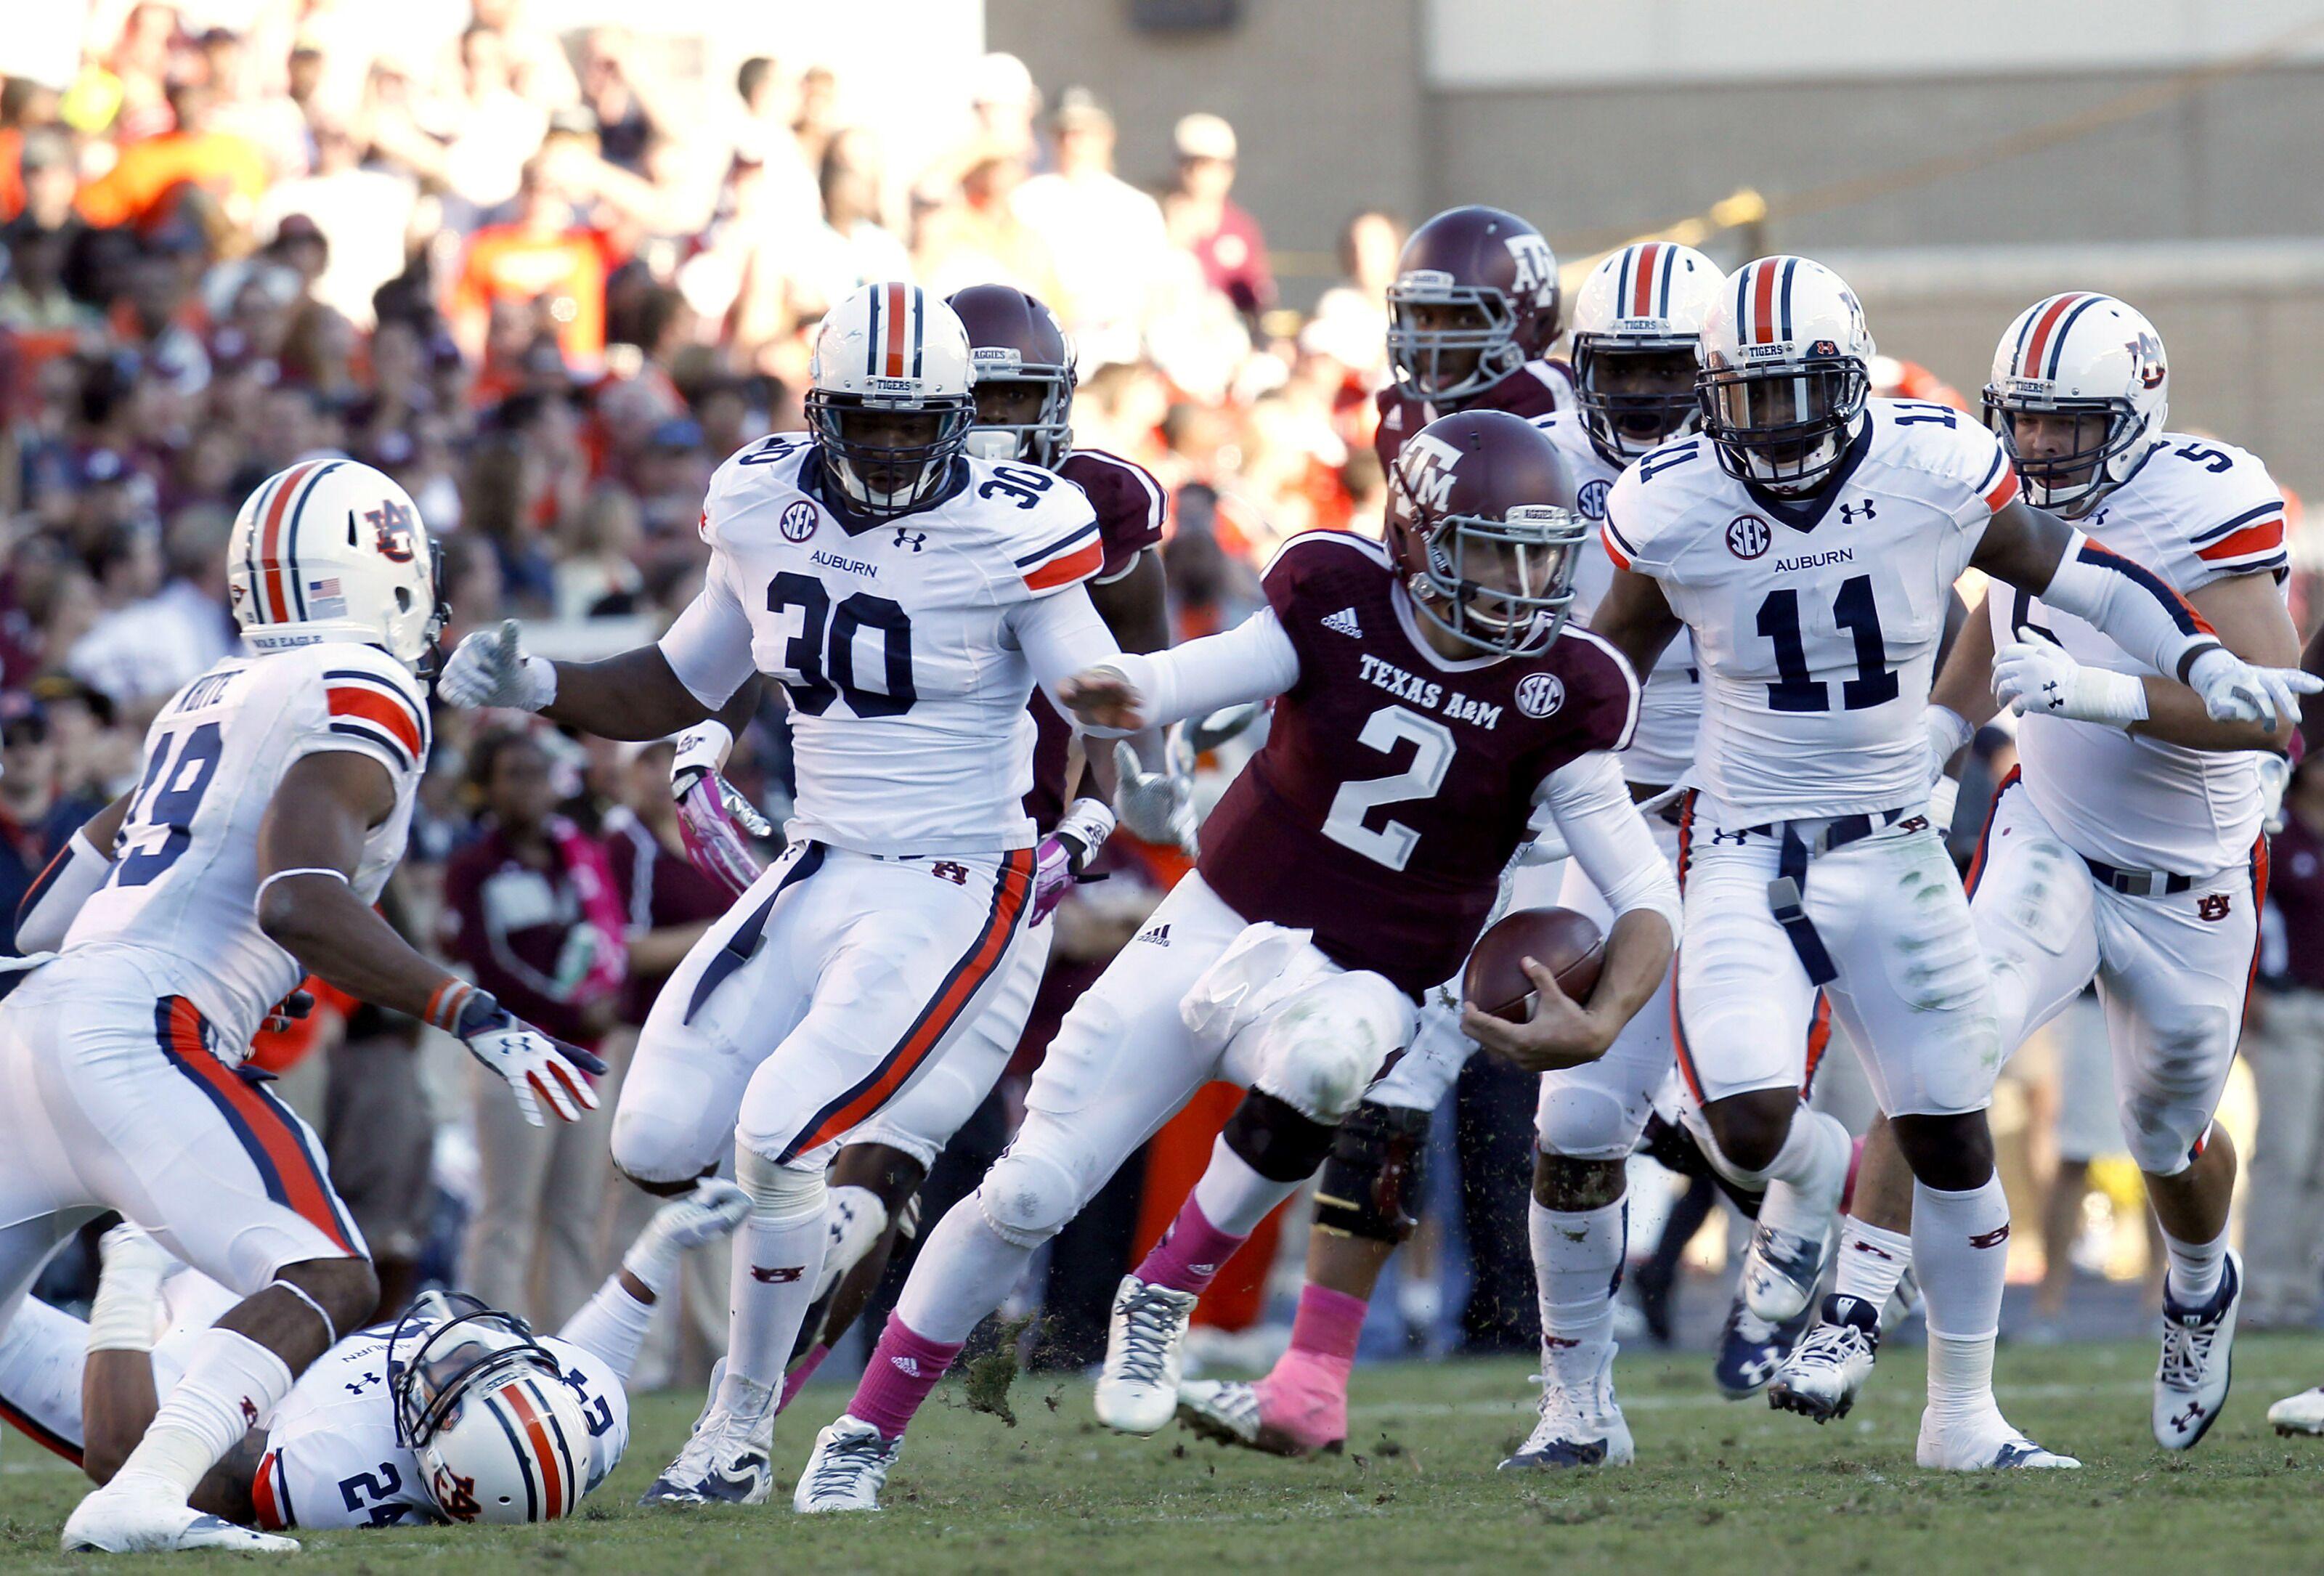 Auburn Football: Top 3 Games in Auburn vs Texas A&M History